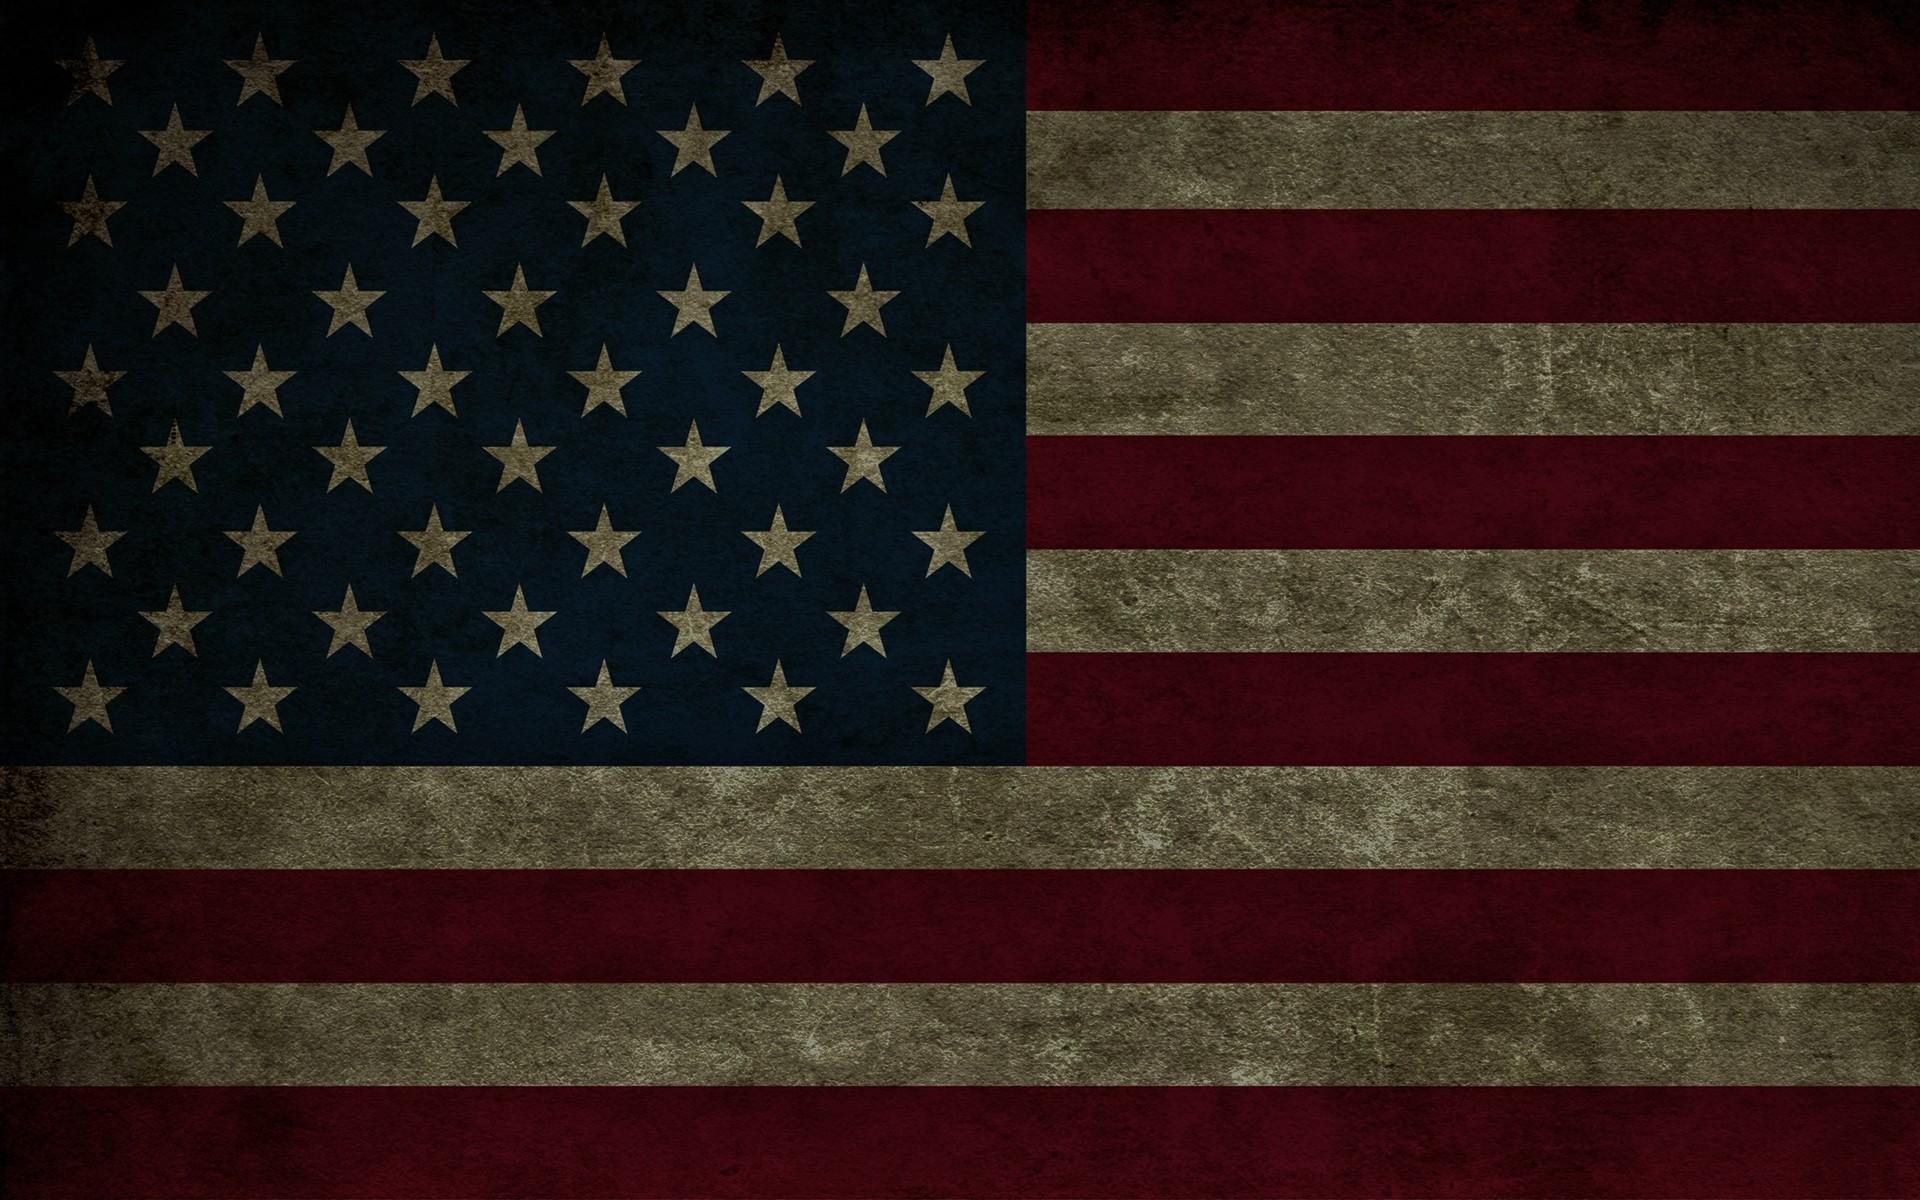 American flag background tumblr tumblr american flag wallpaper american flag background tumblr voltagebd Gallery